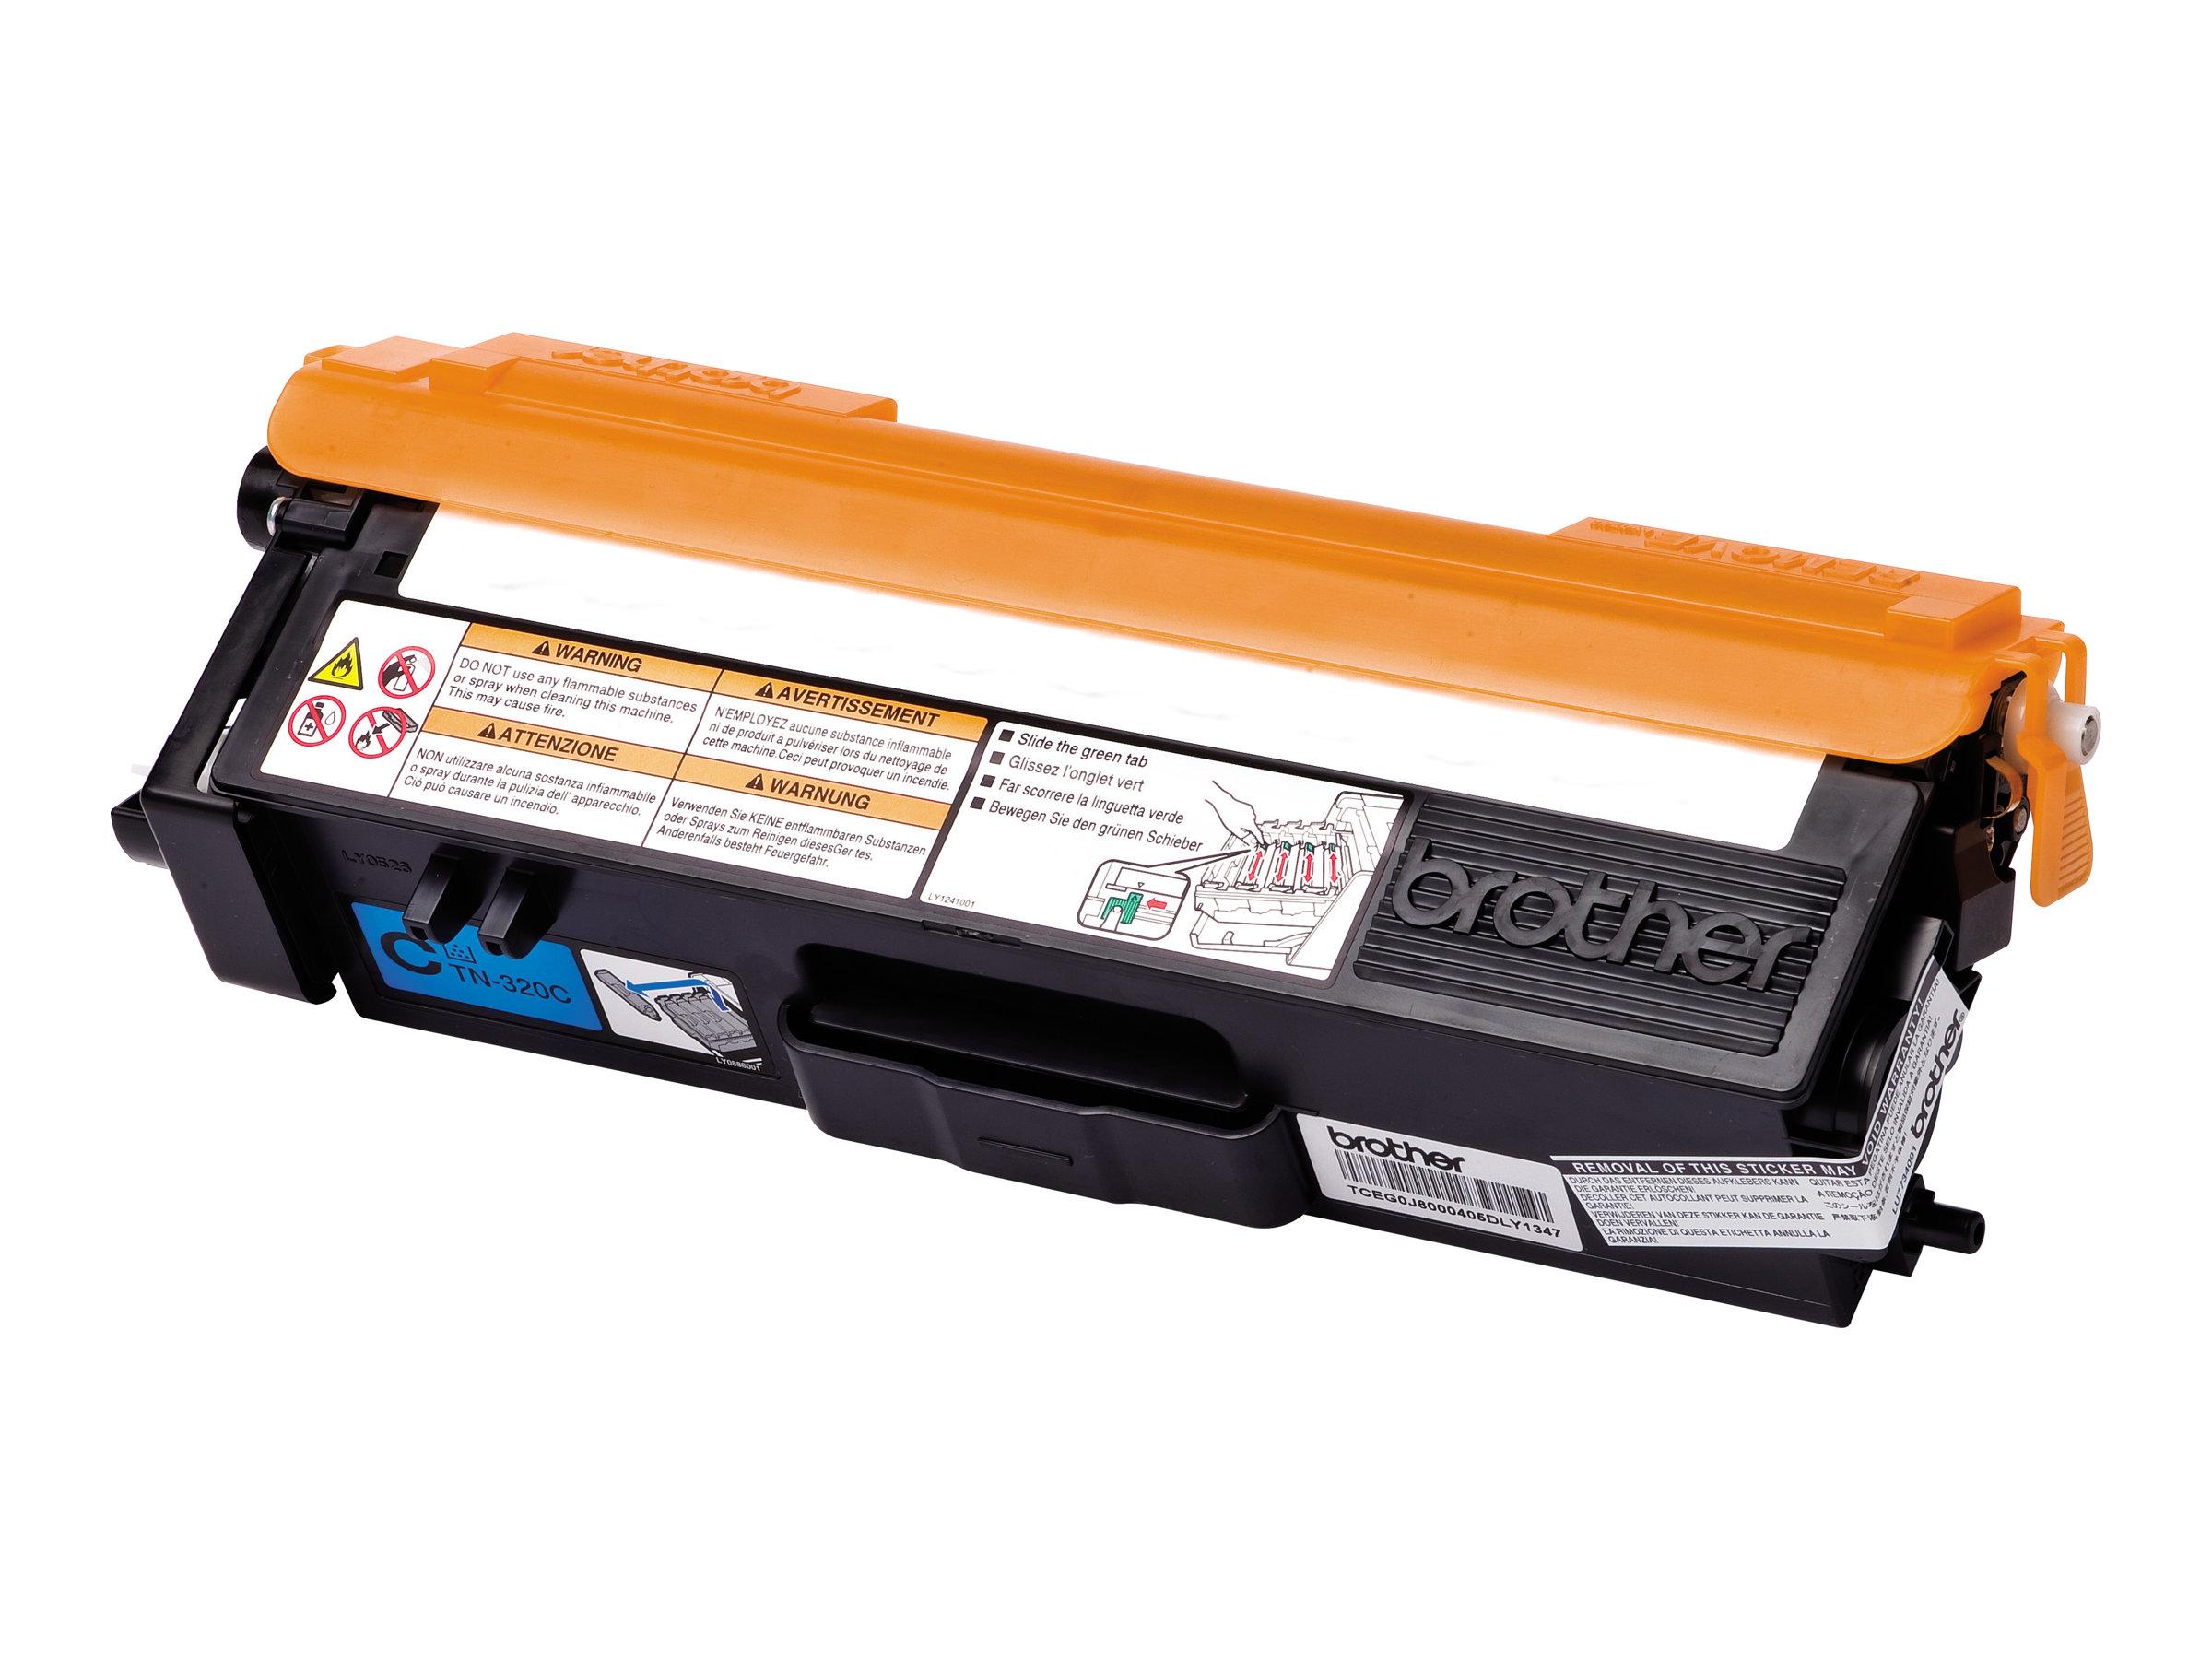 Brother TN320C - Cyan - Original - Tonerpatrone - für Brother DCP-9055, DCP-9270, HL-4140, HL-4150, HL-4570, MFC-9460, MFC-9465,